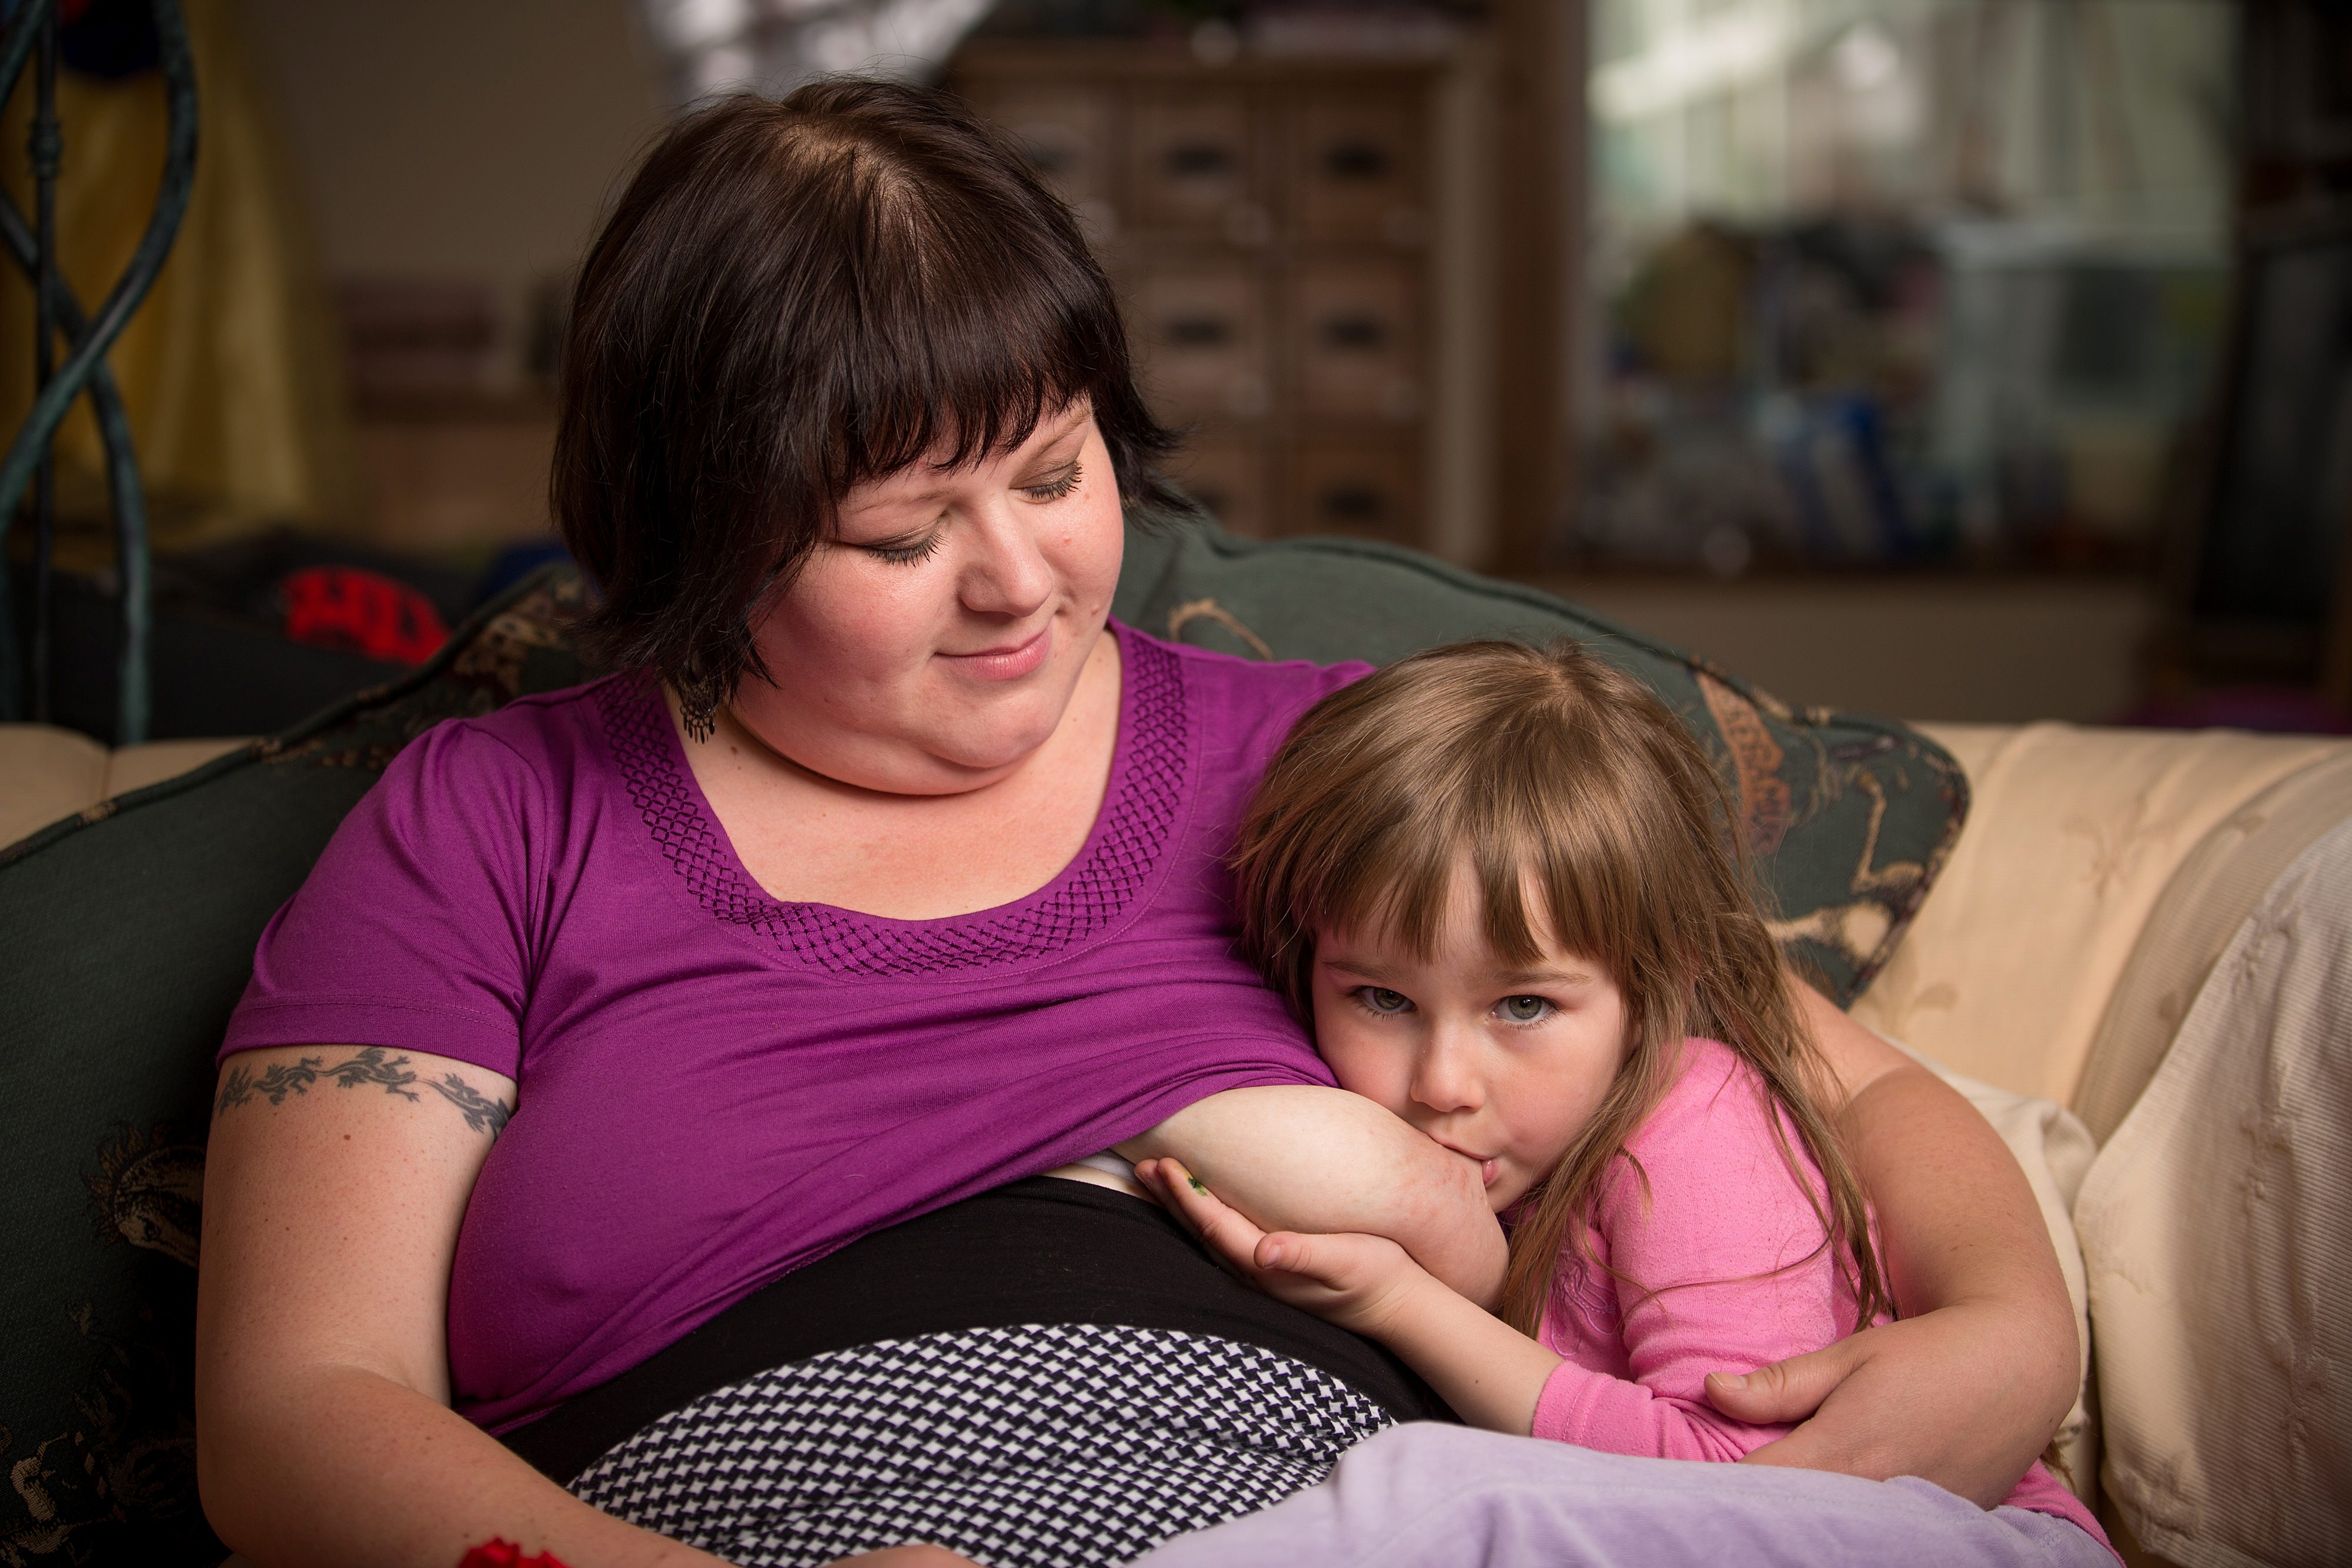 Mothers who breastfeed Photos of women breastfeeding older children